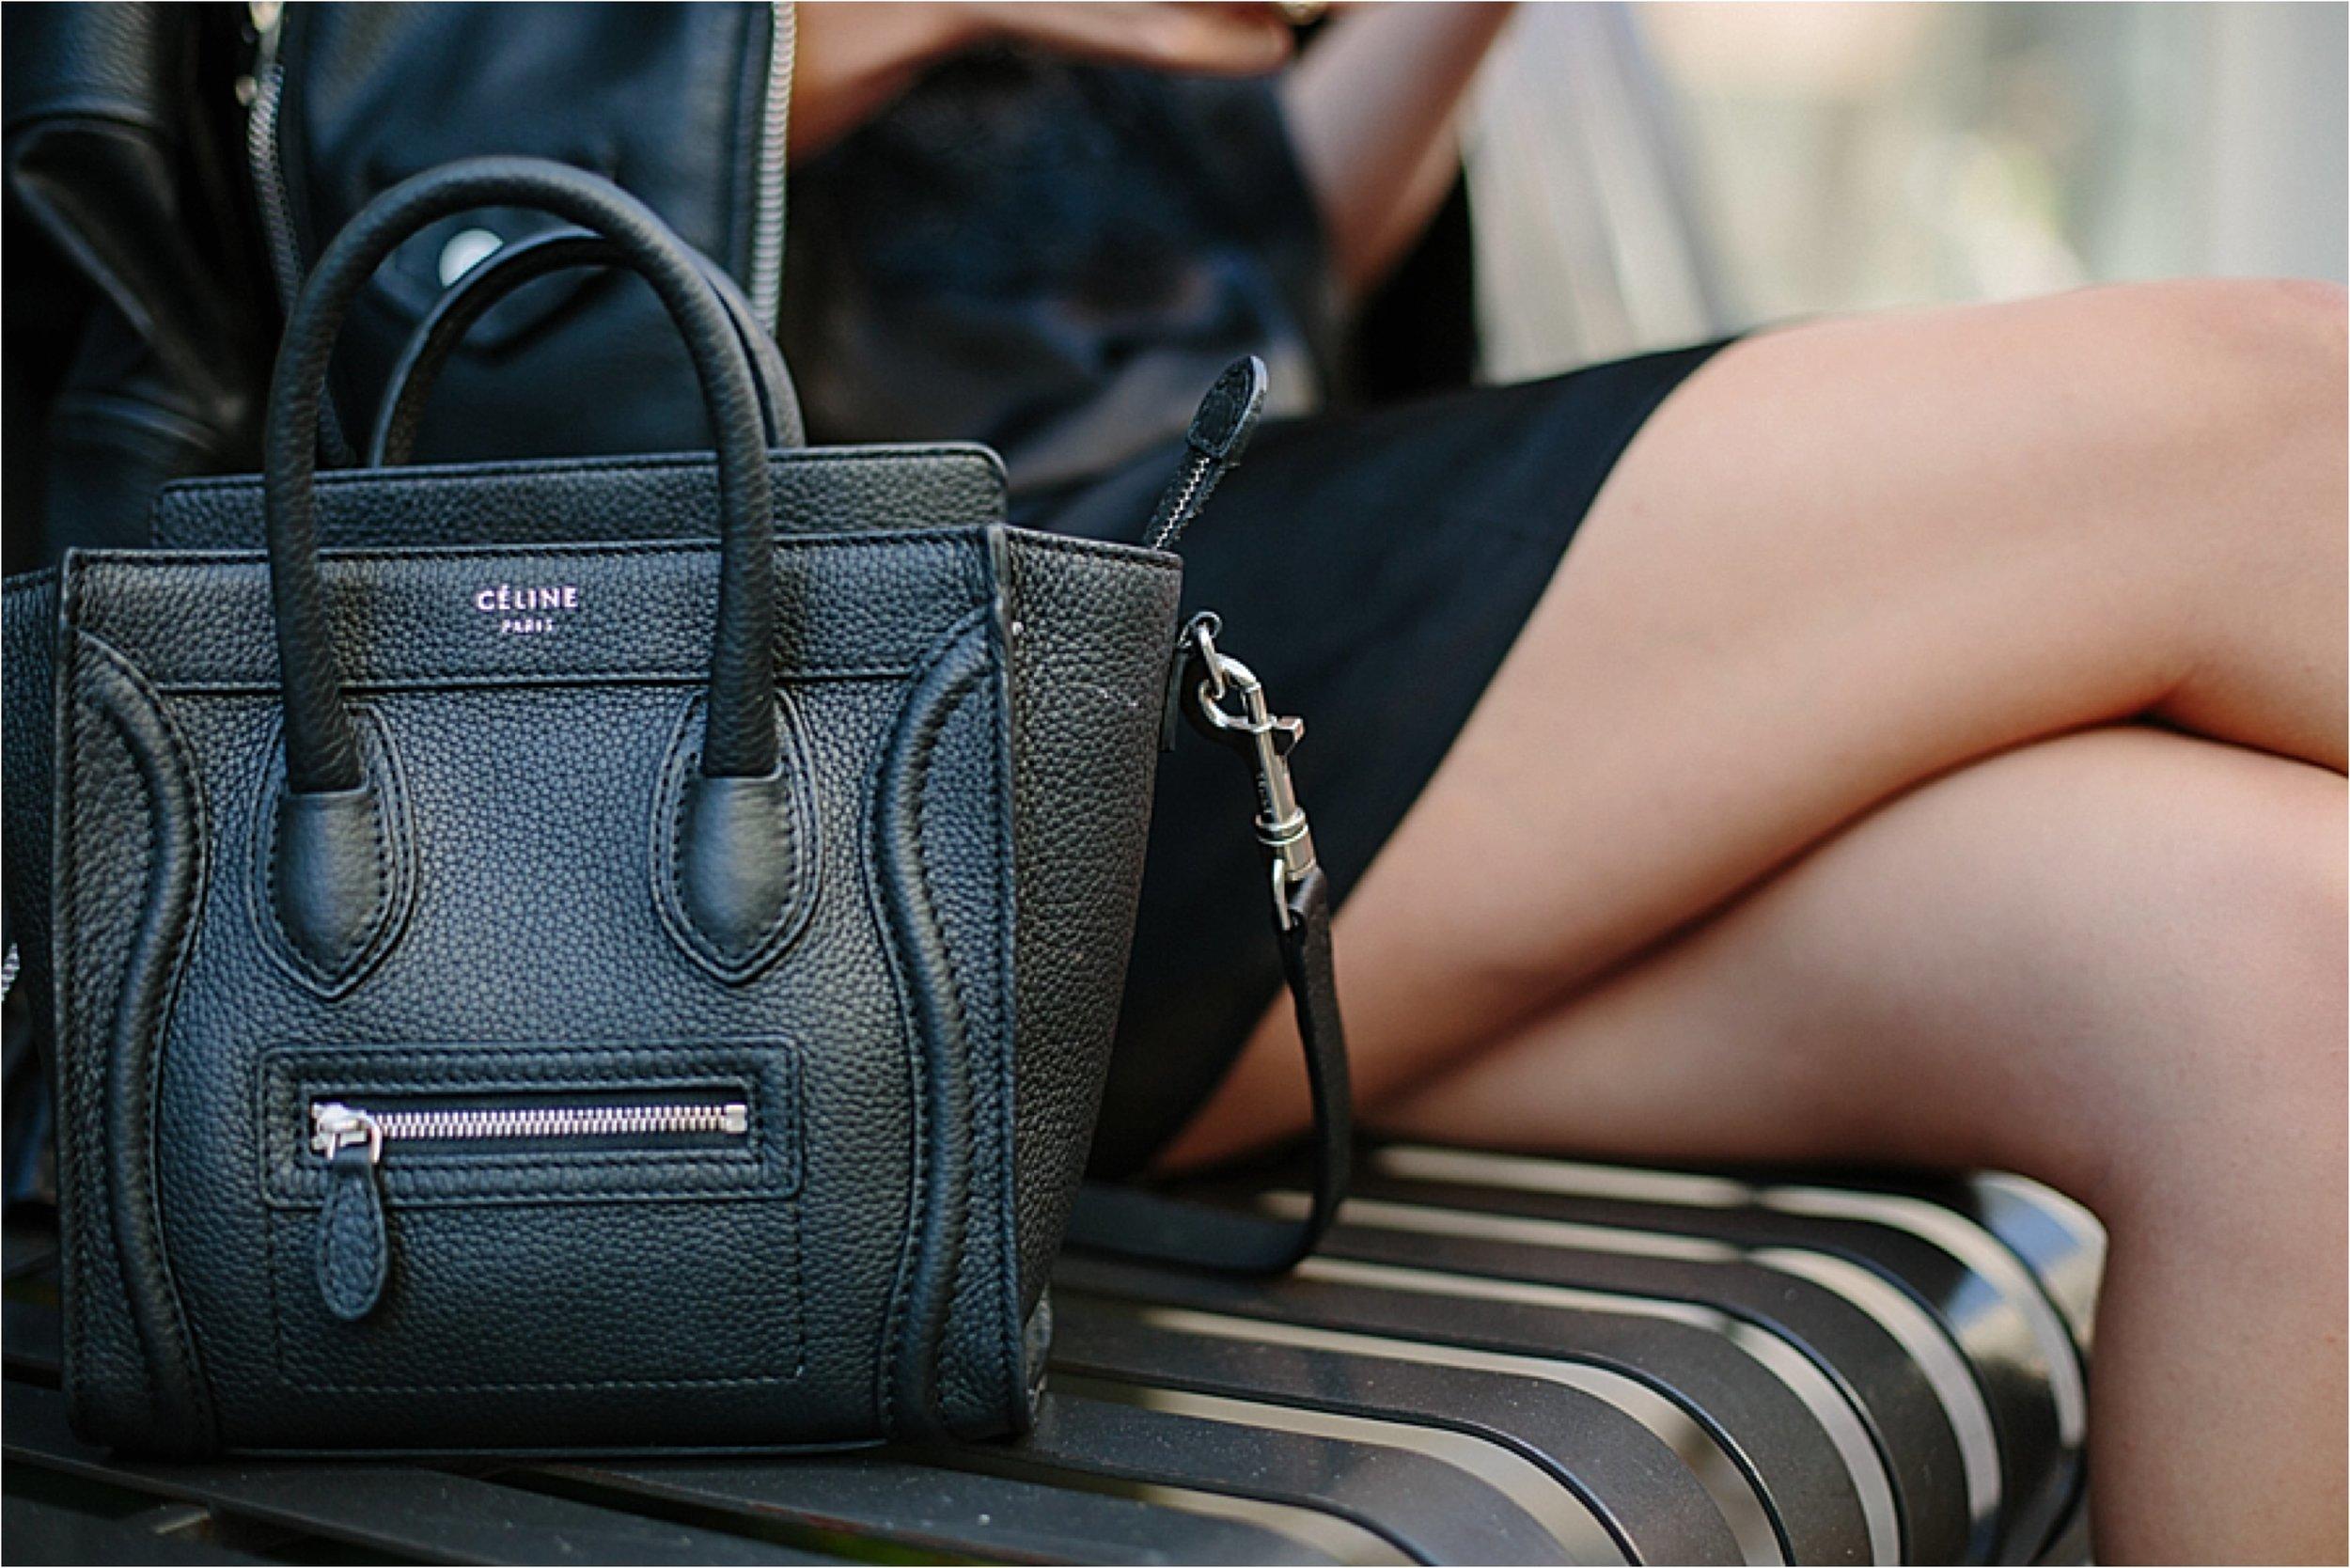 Los Angeles Fashion - Celine Bag Detail Photo